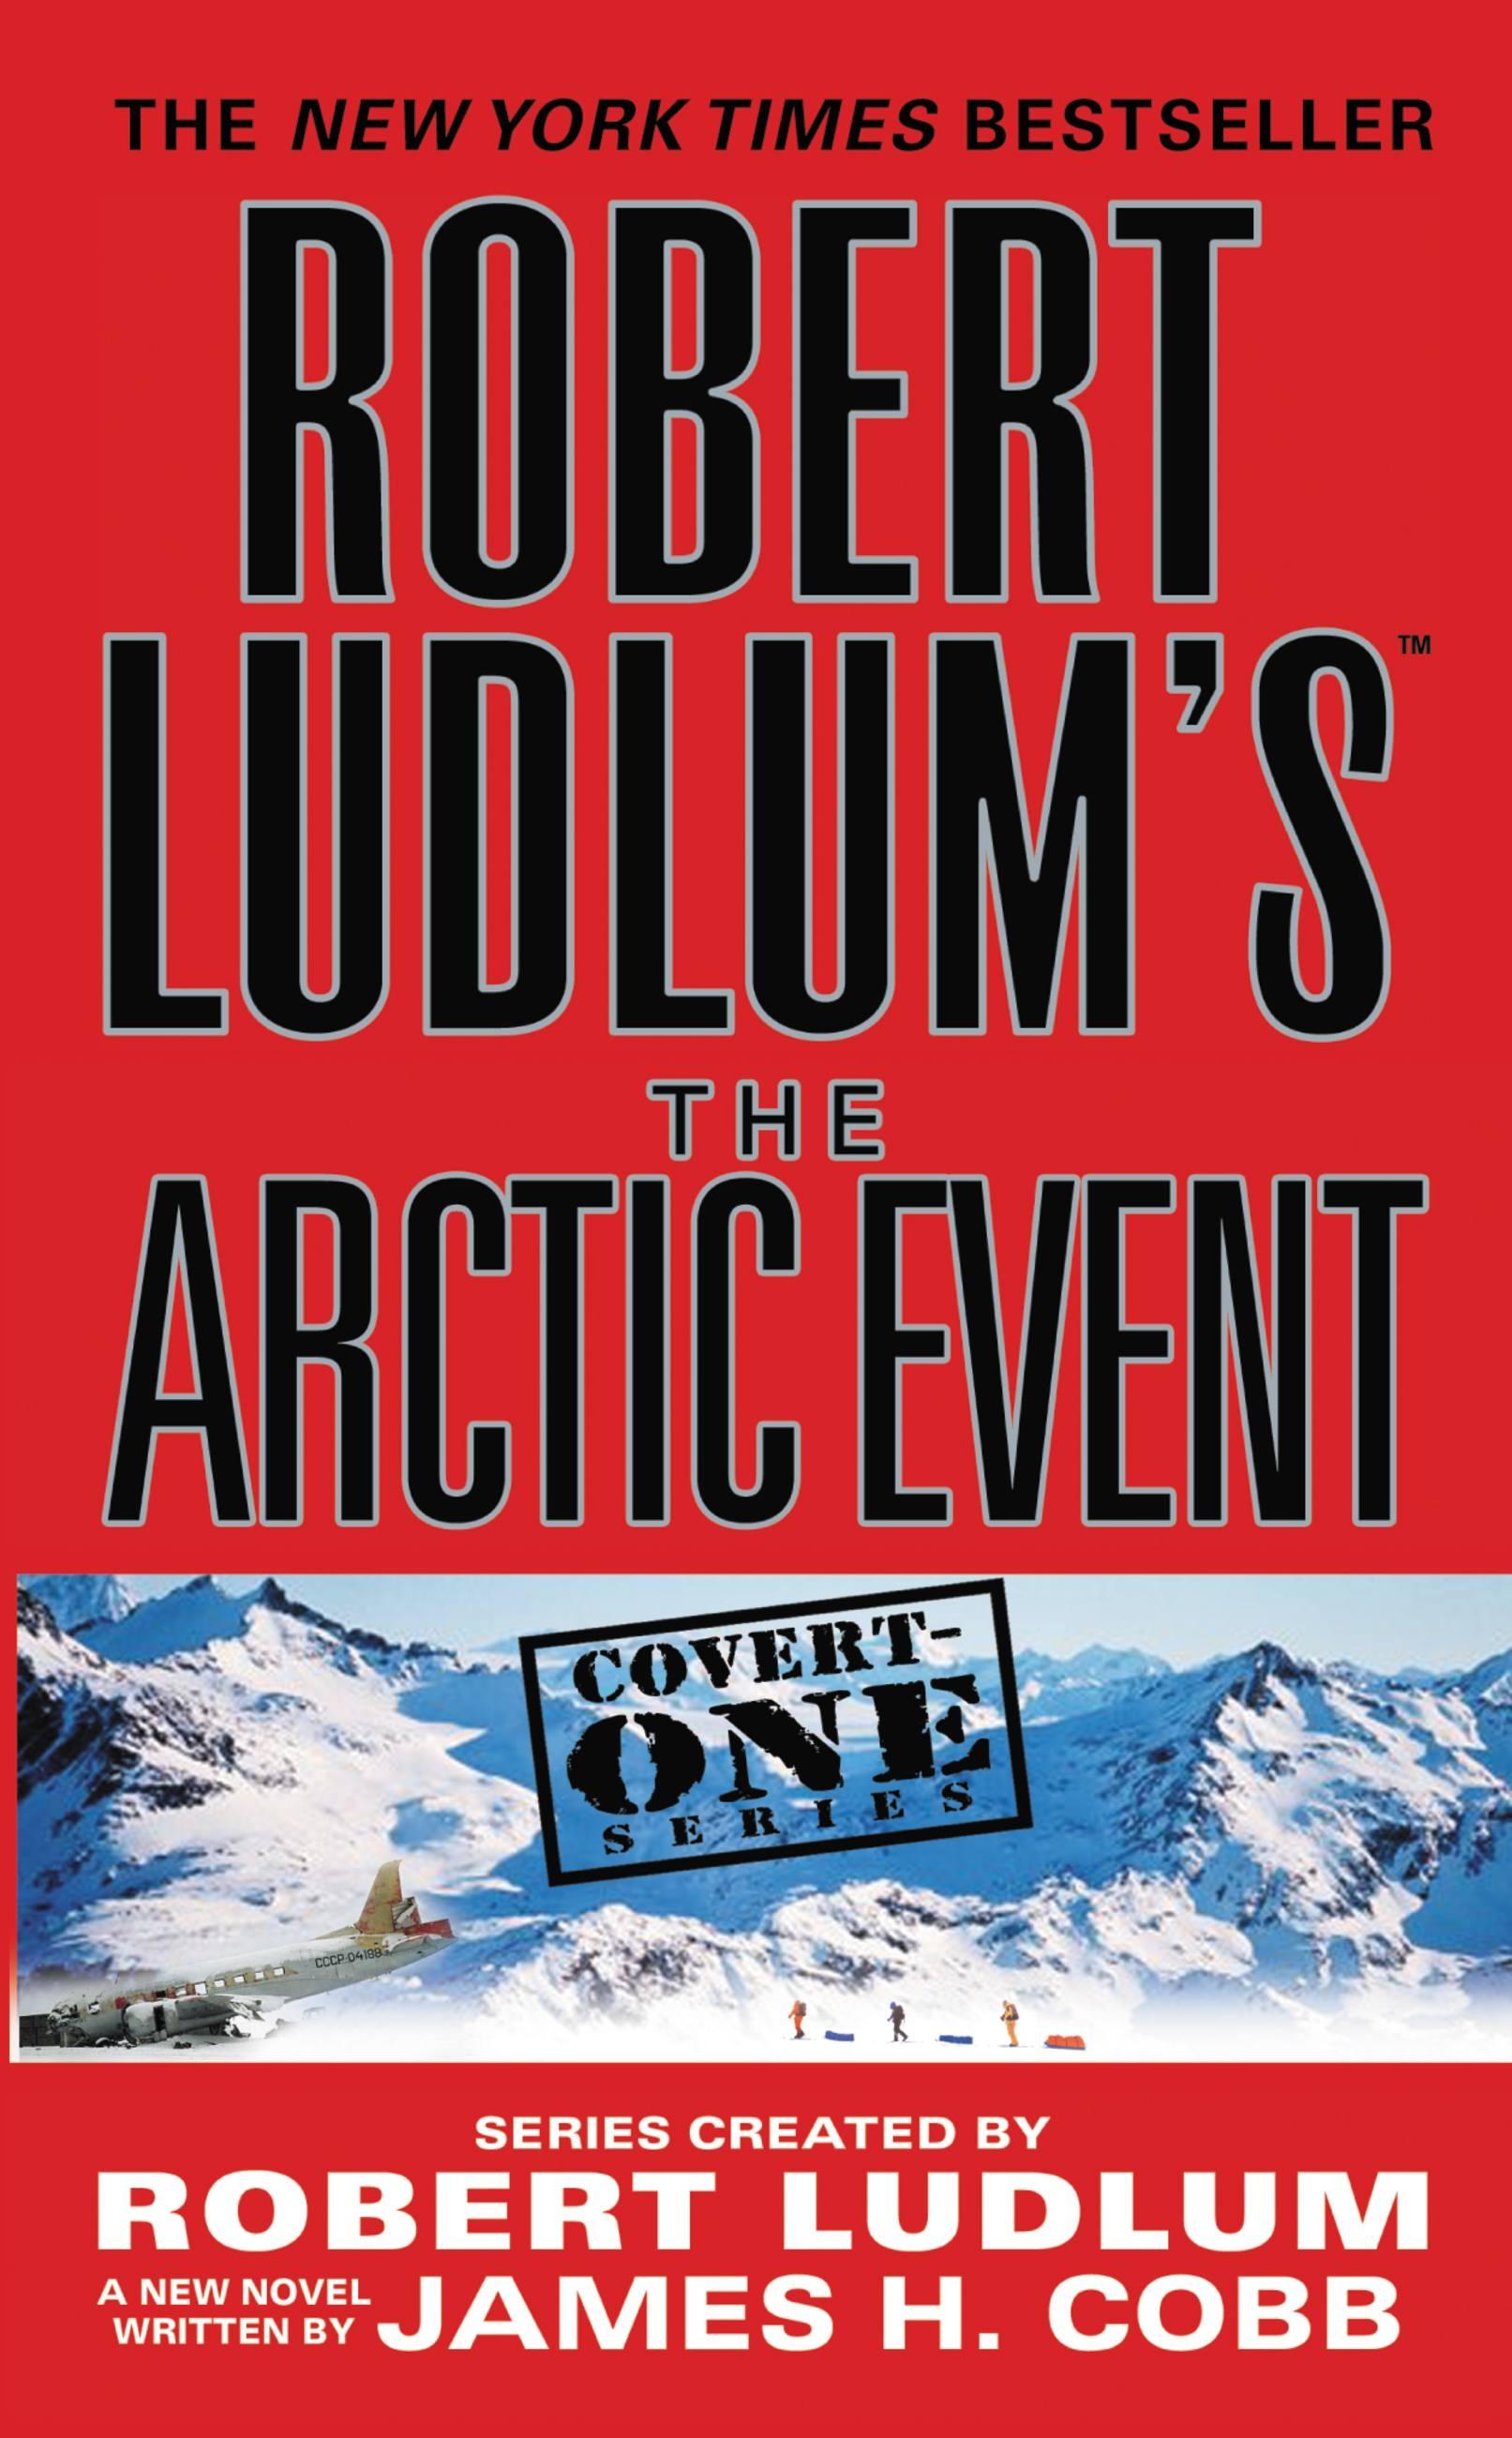 Robert Ludlum's (TM) The Arctic Event by Robert Ludlum ...